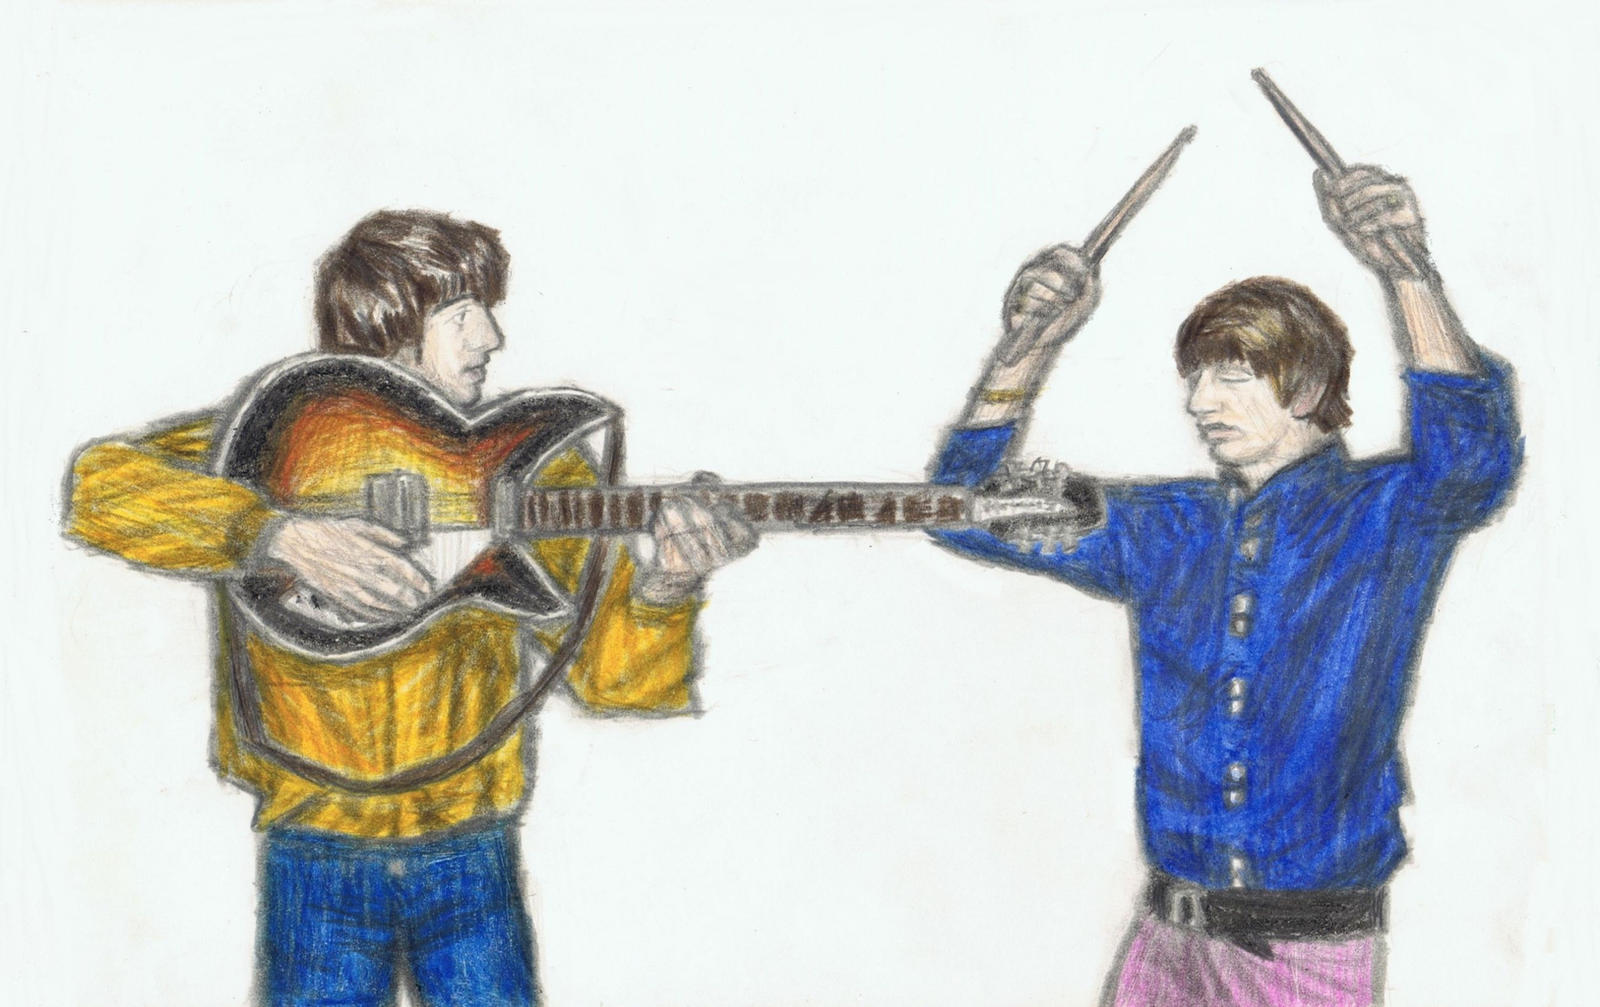 Ringo freeze by gagambo